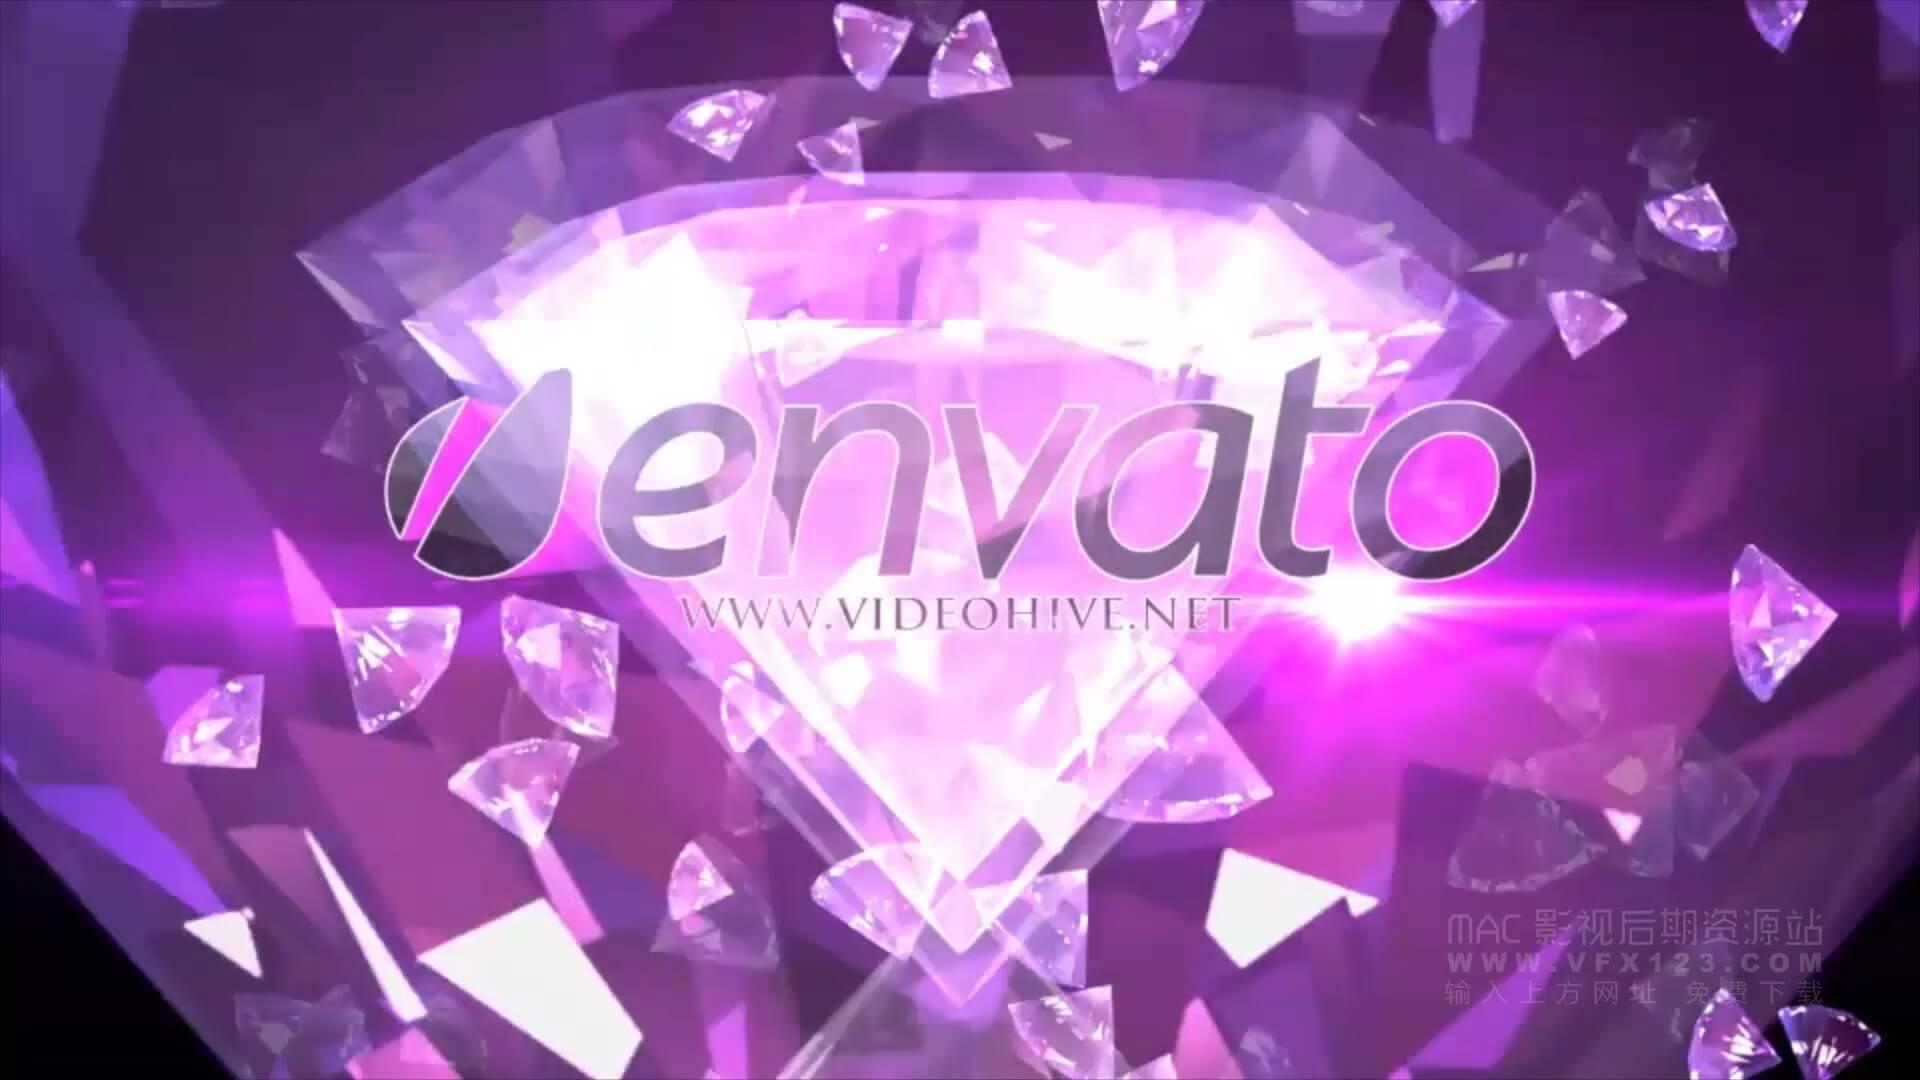 Motion模板 婚礼舞会派对夜场迪厅开场视频 珠宝钻石促销